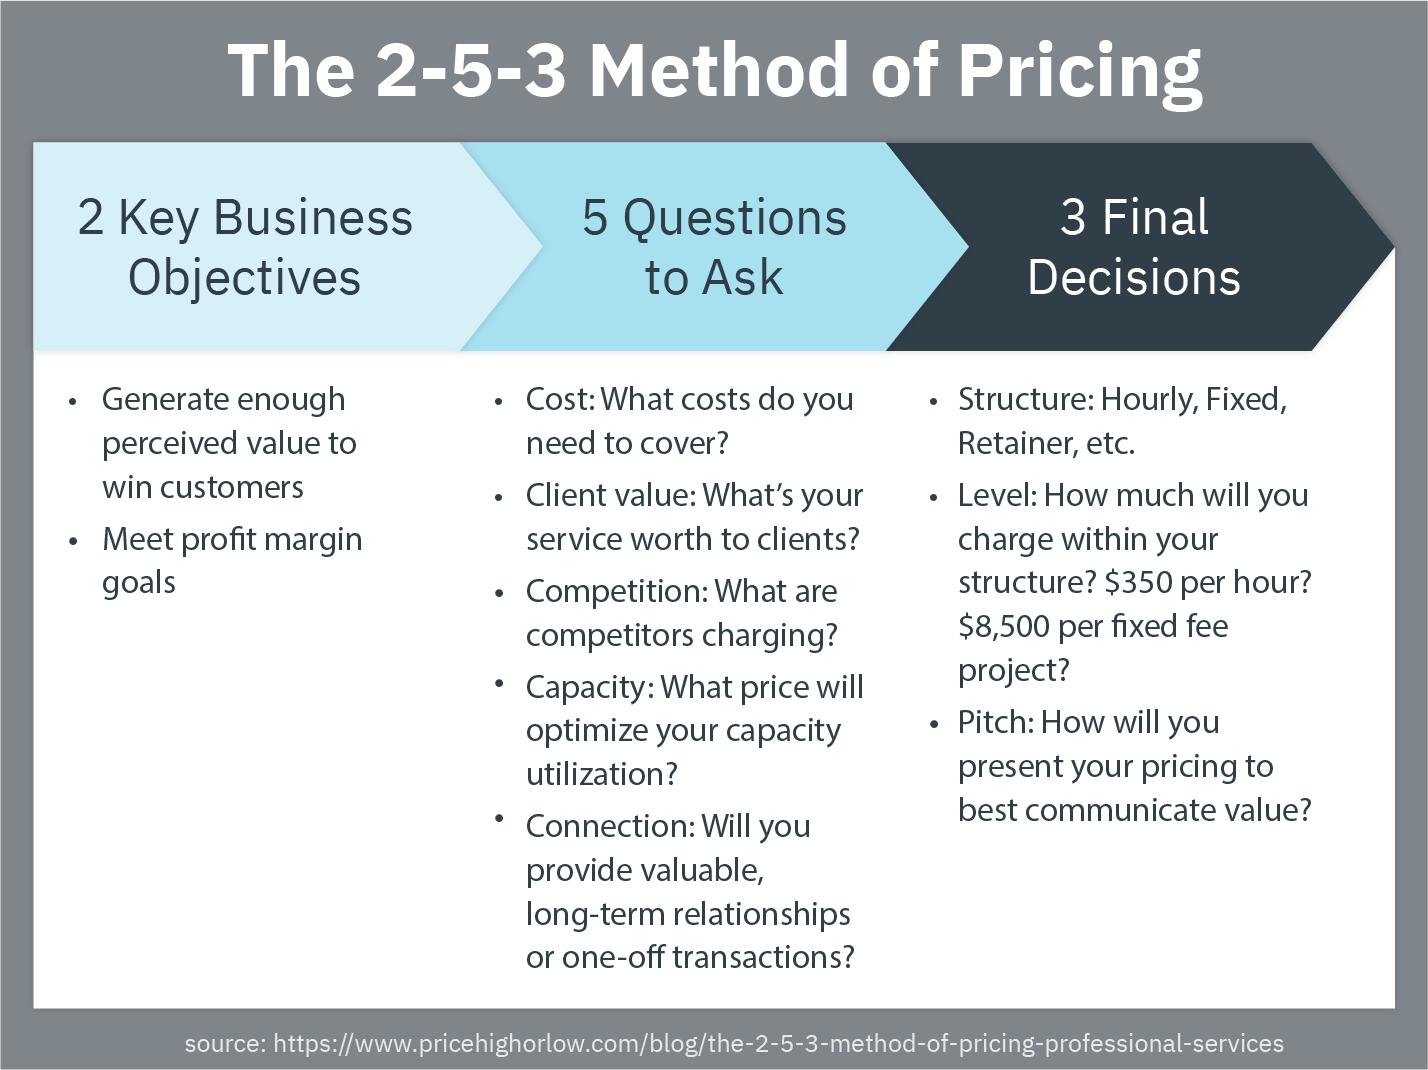 2-5-3 Method